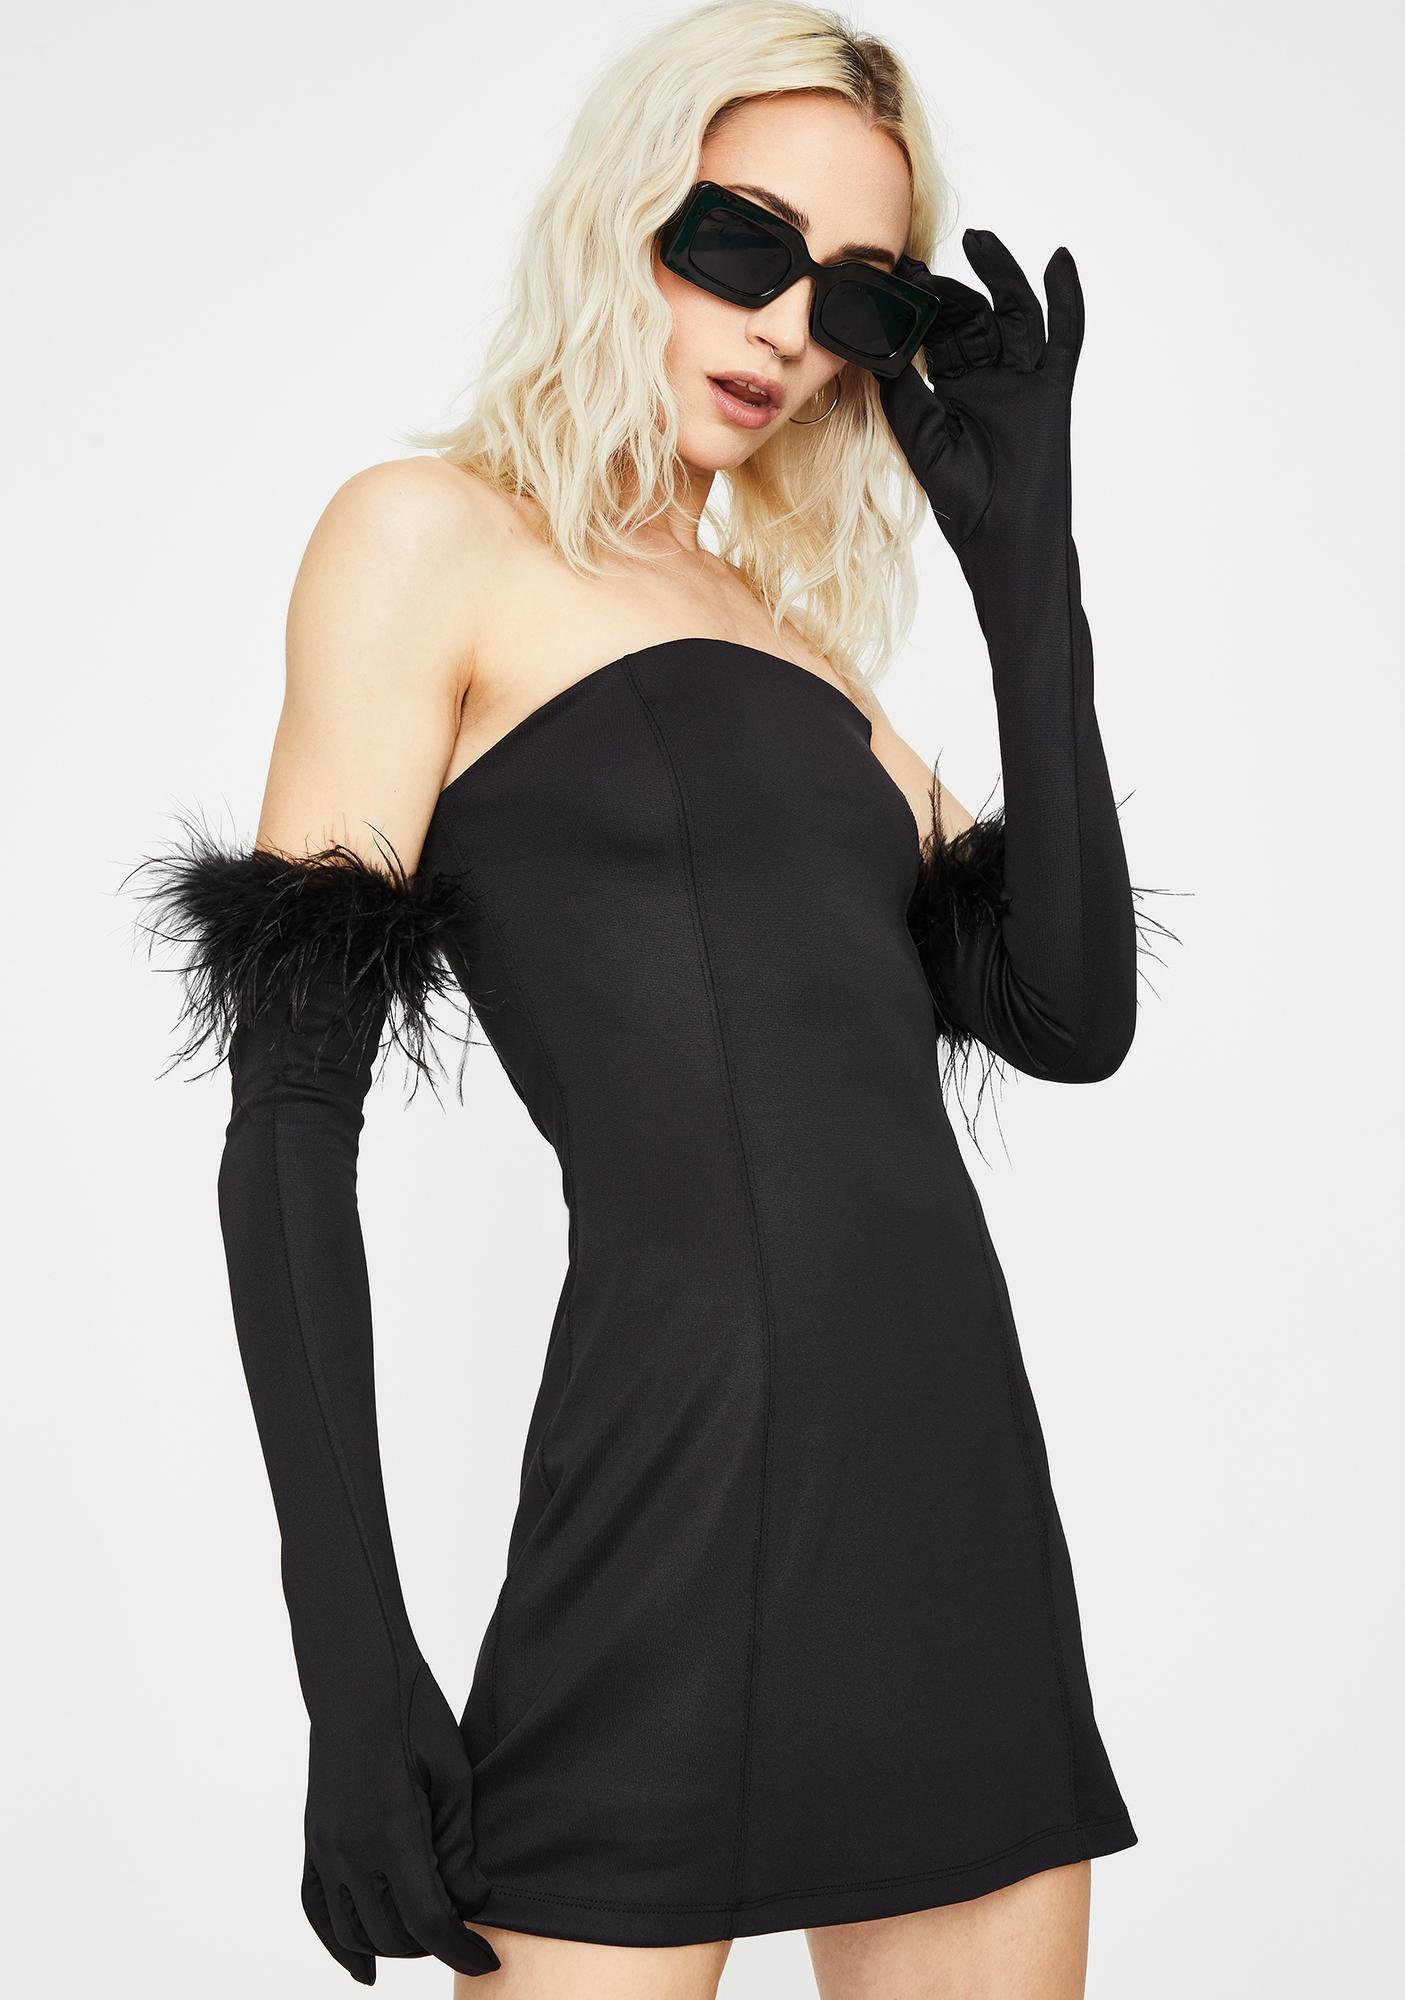 Kiki Riki Noir Have Some Fun Strapless Dress